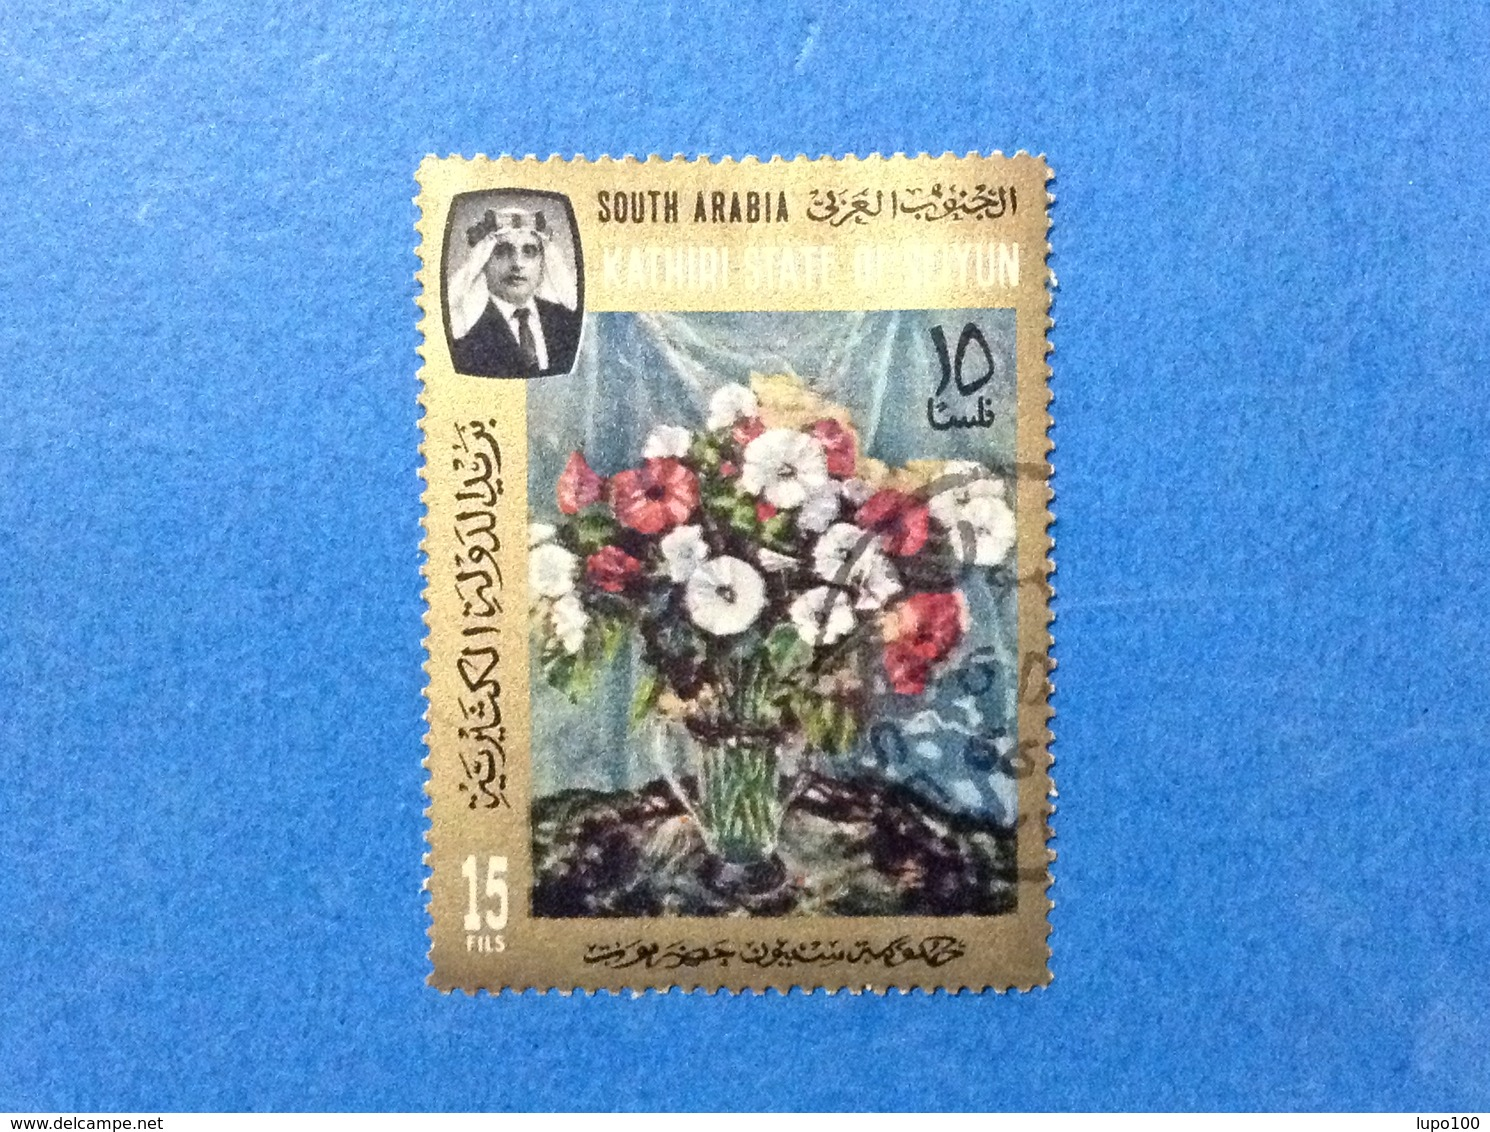 SOUTH ARABIA KATHIRI STATE OF SEIYUN 15 F ARTE DIPINTO QUADRO FRANCOBOLLO USATO STAMP USED - Emirati Arabi Uniti